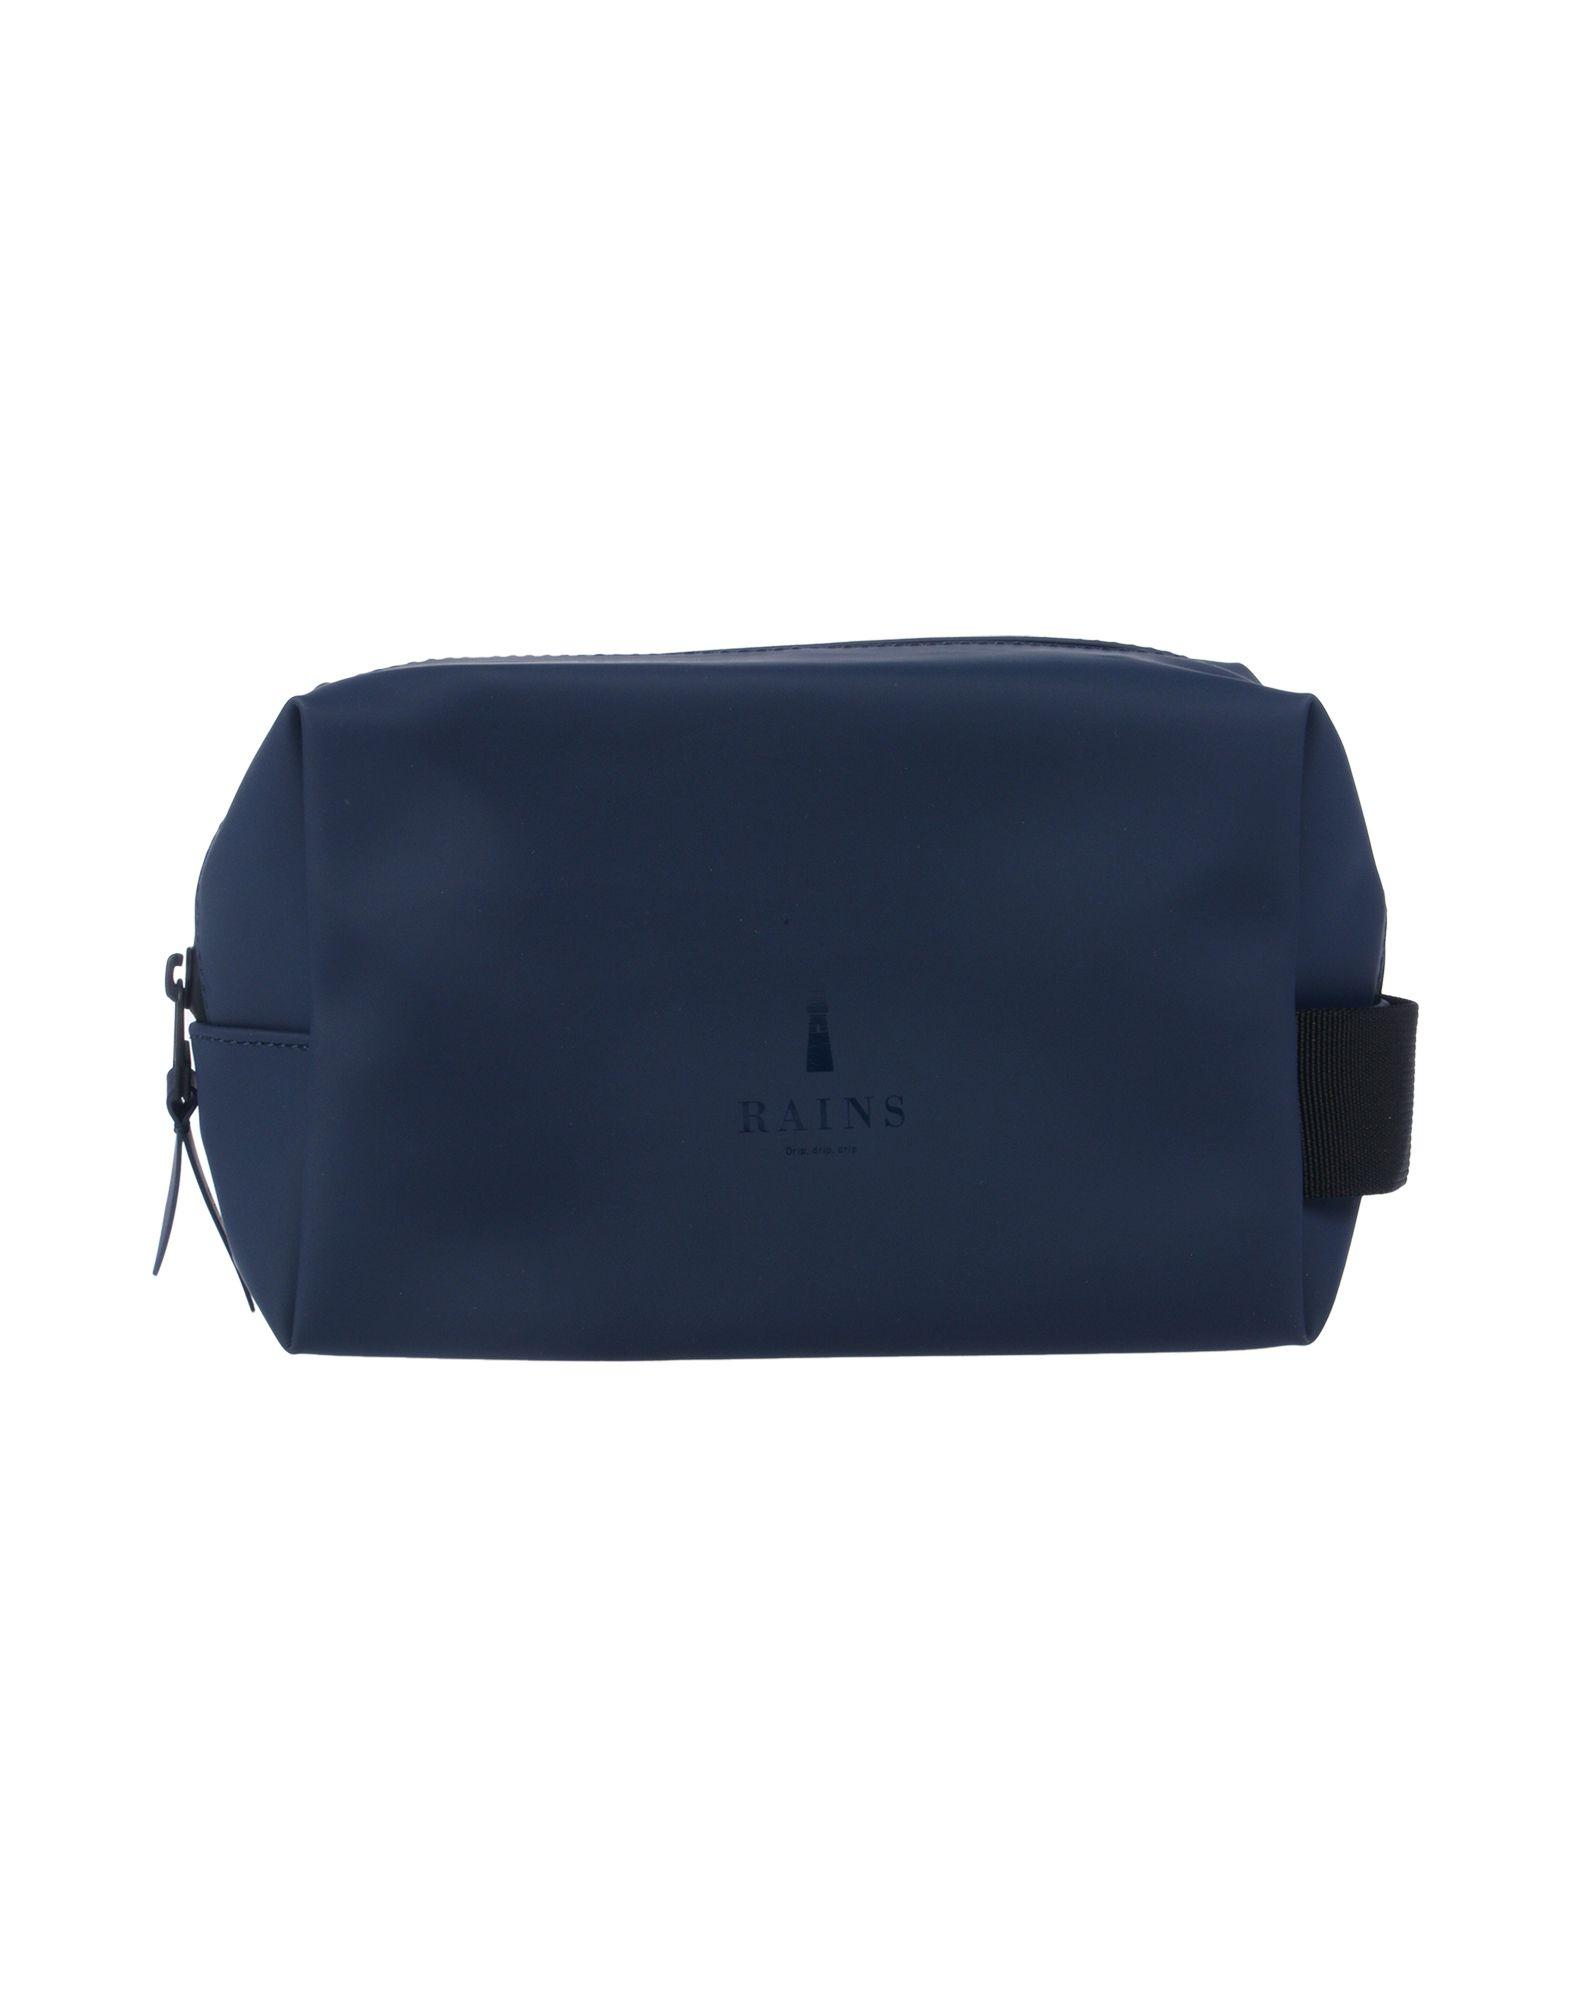 RAINS Beauty case 0 85m heavy duty tactical gun slip bevel carry bag rifle case bag cover shoulder backup pouch hunting shotgun carrying case